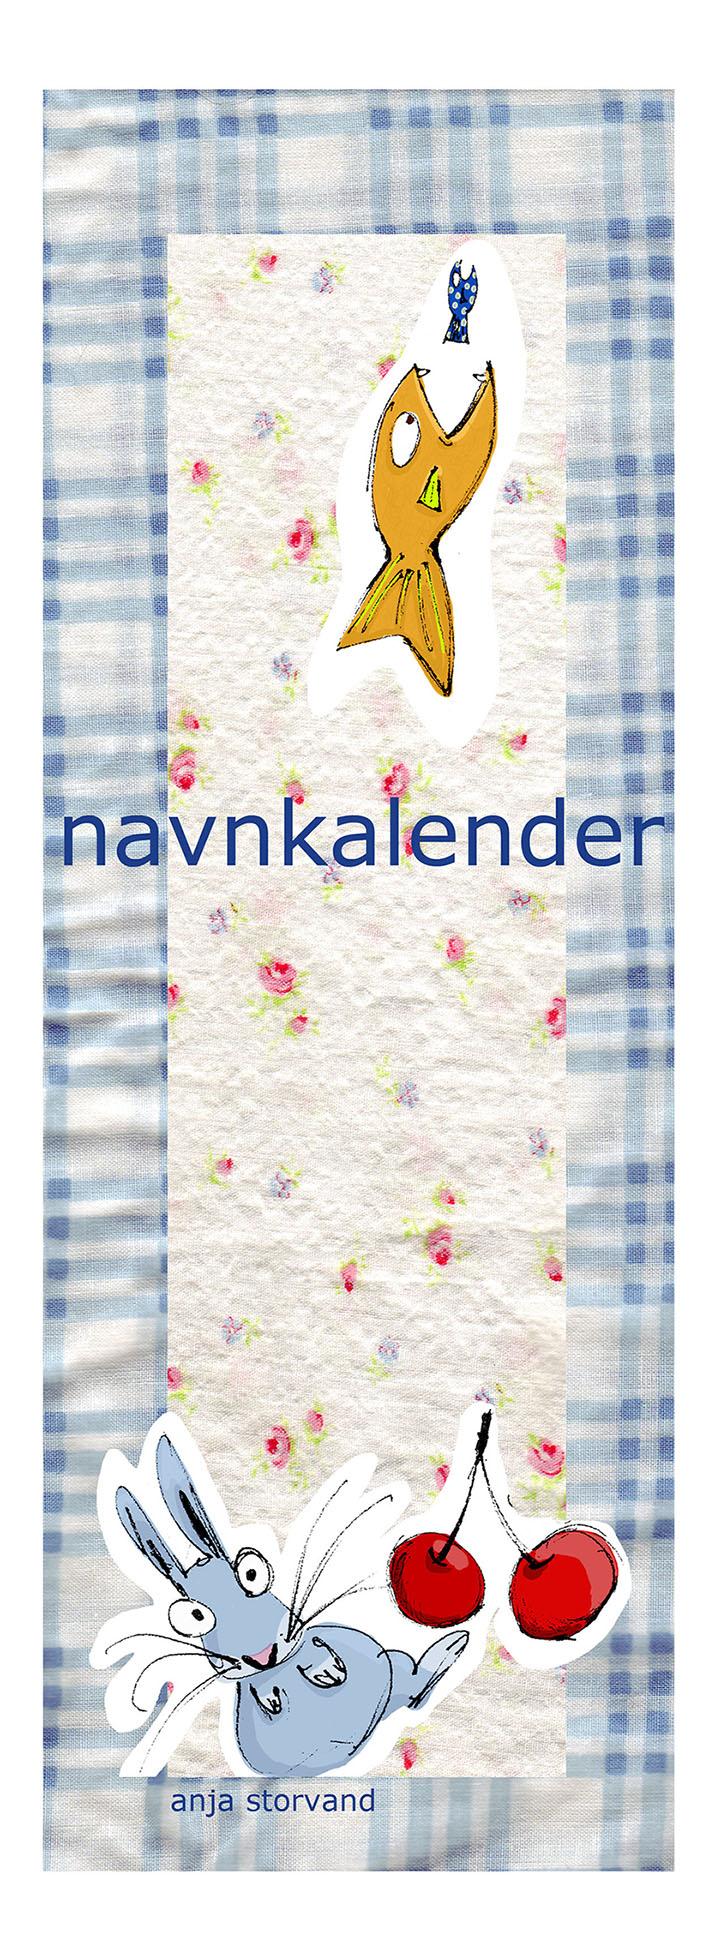 navnkalender